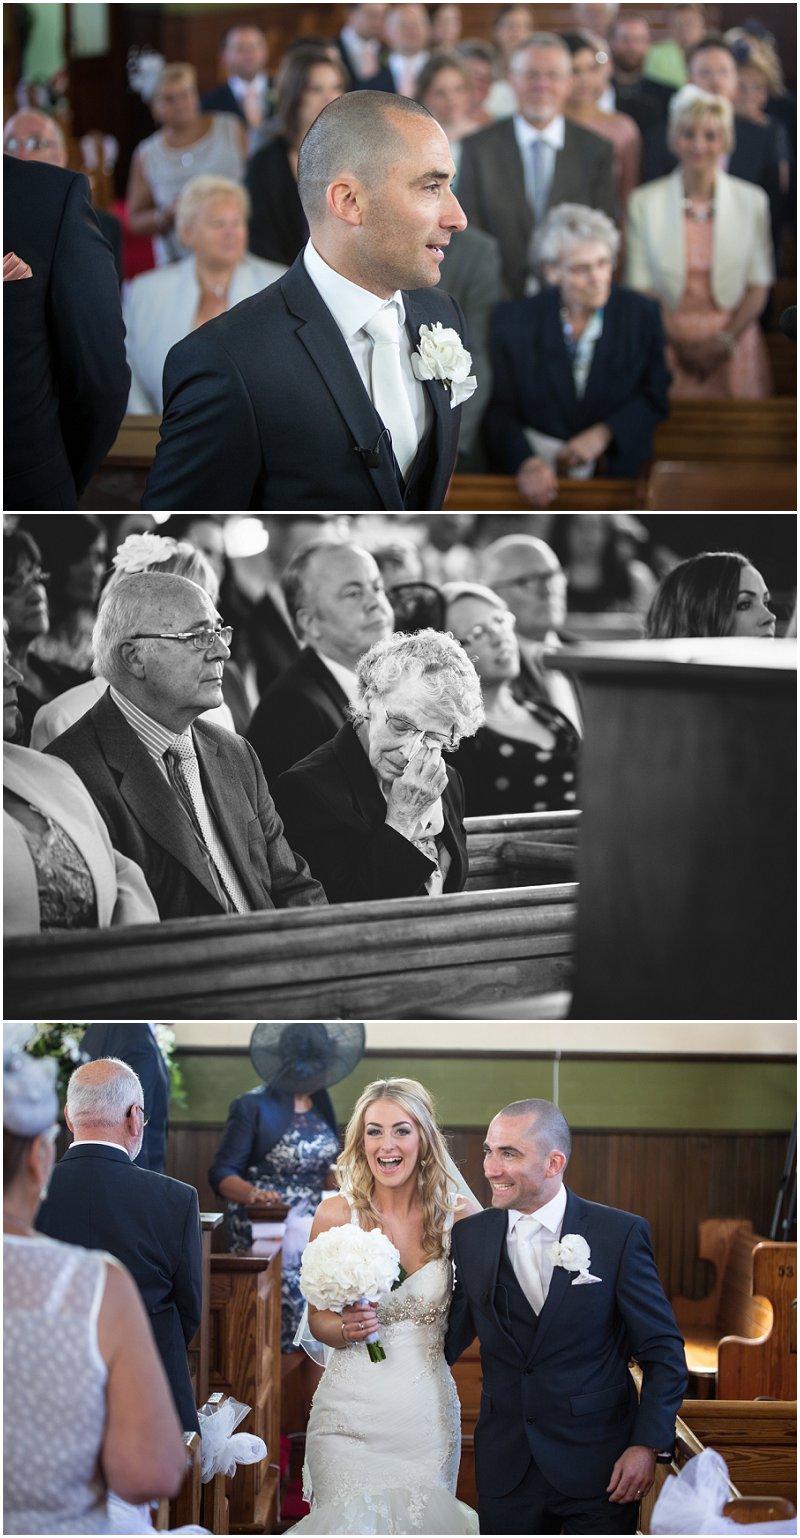 Wedding Ceremony Anglesey Photographer